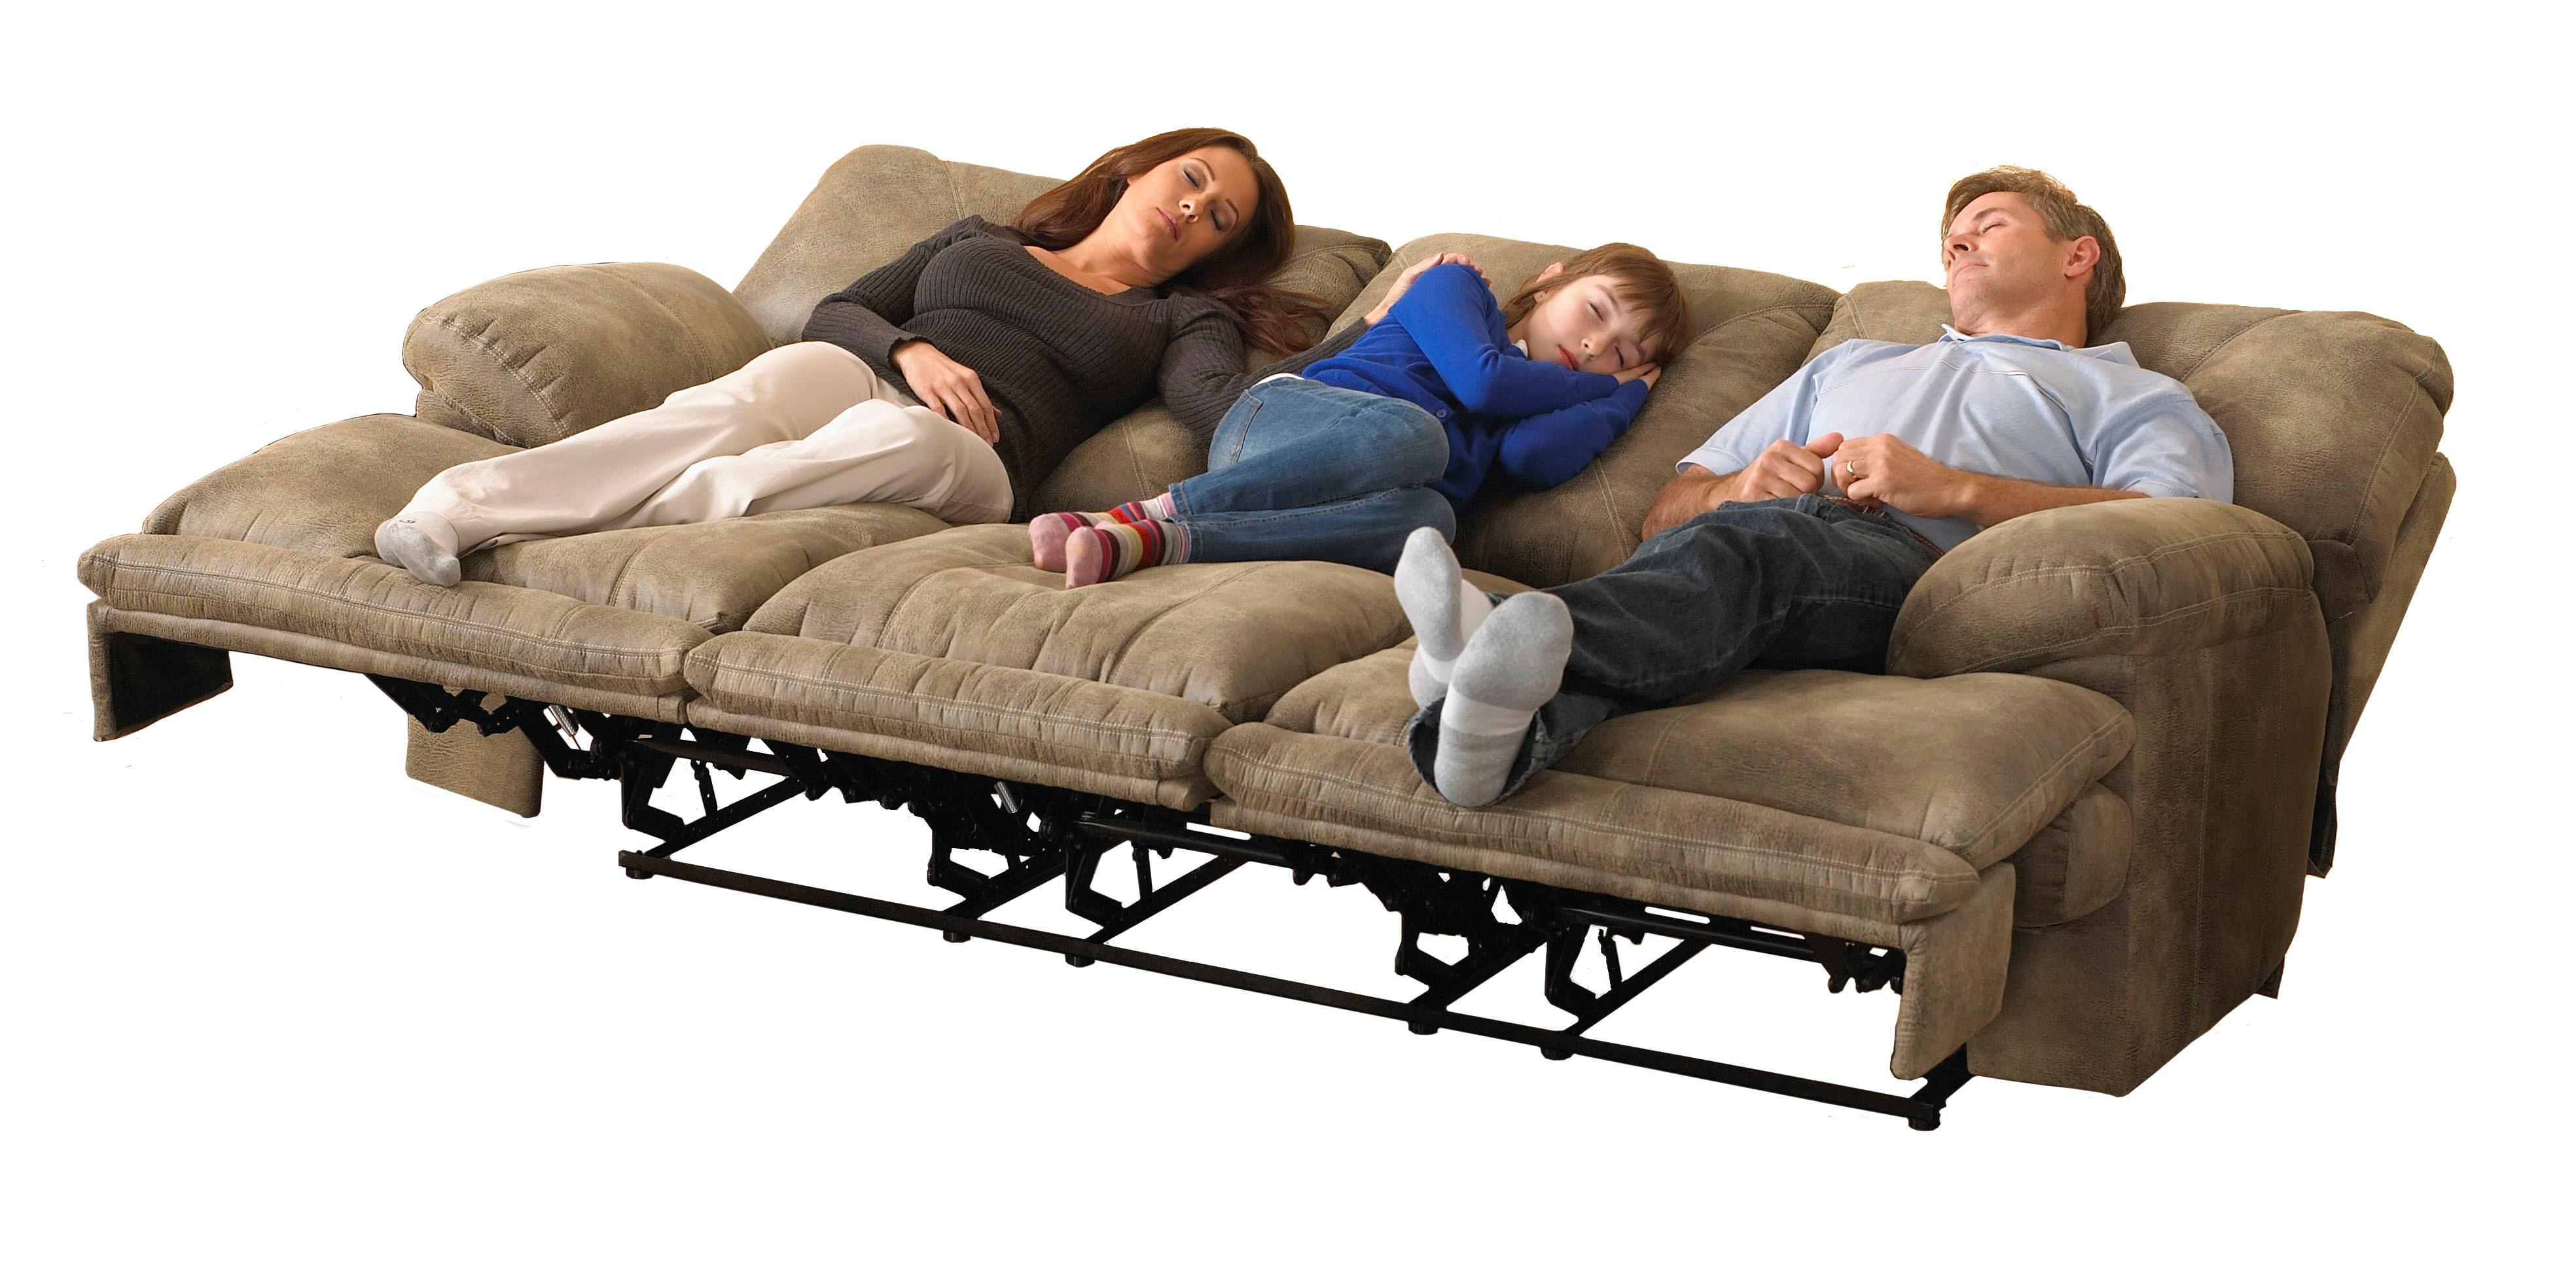 furniture fair stores in cincinnati free home design